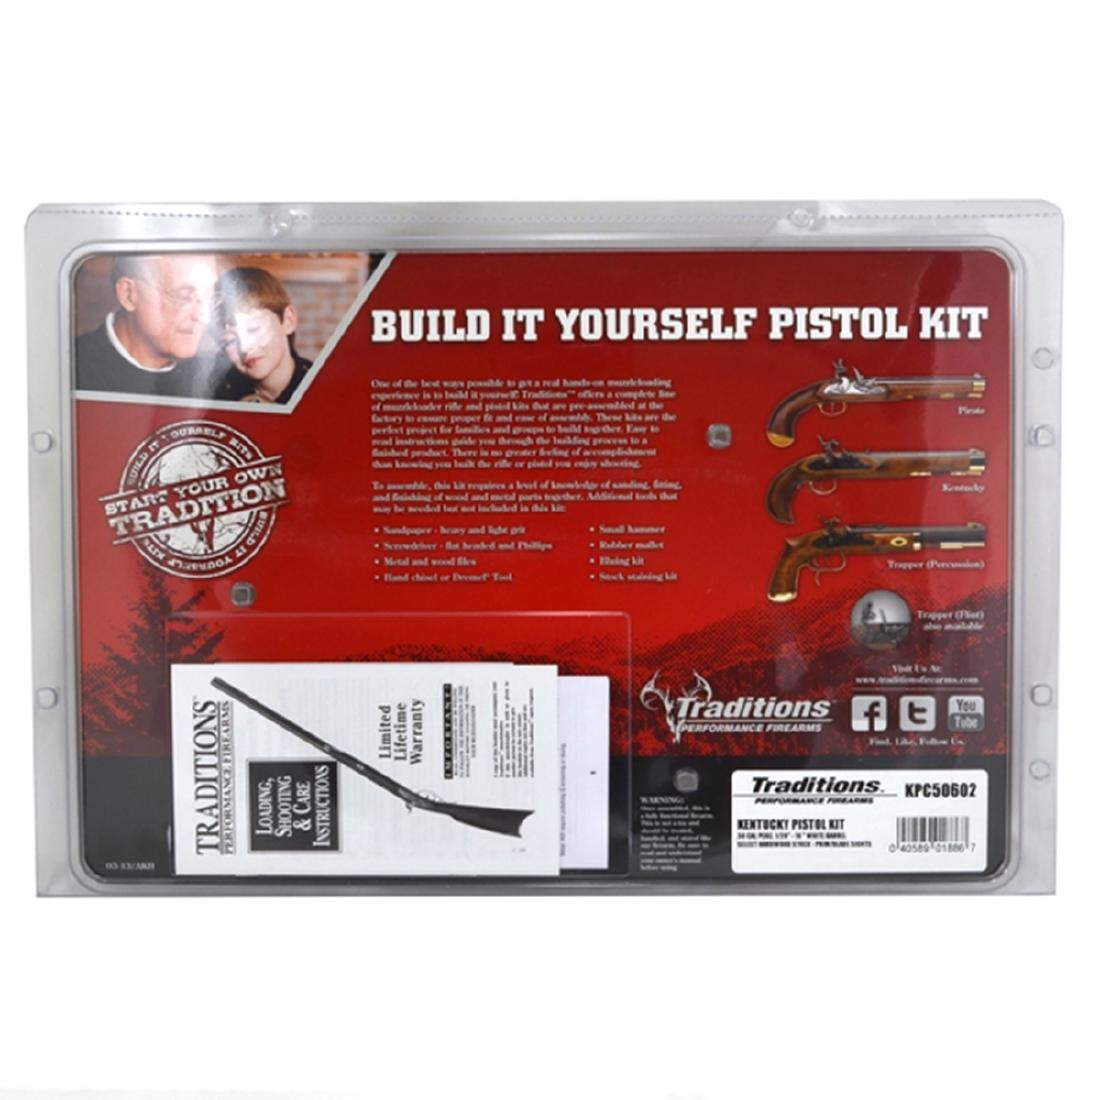 Exquisite New Kentucky Pistol Kit Original Box Papers - 2